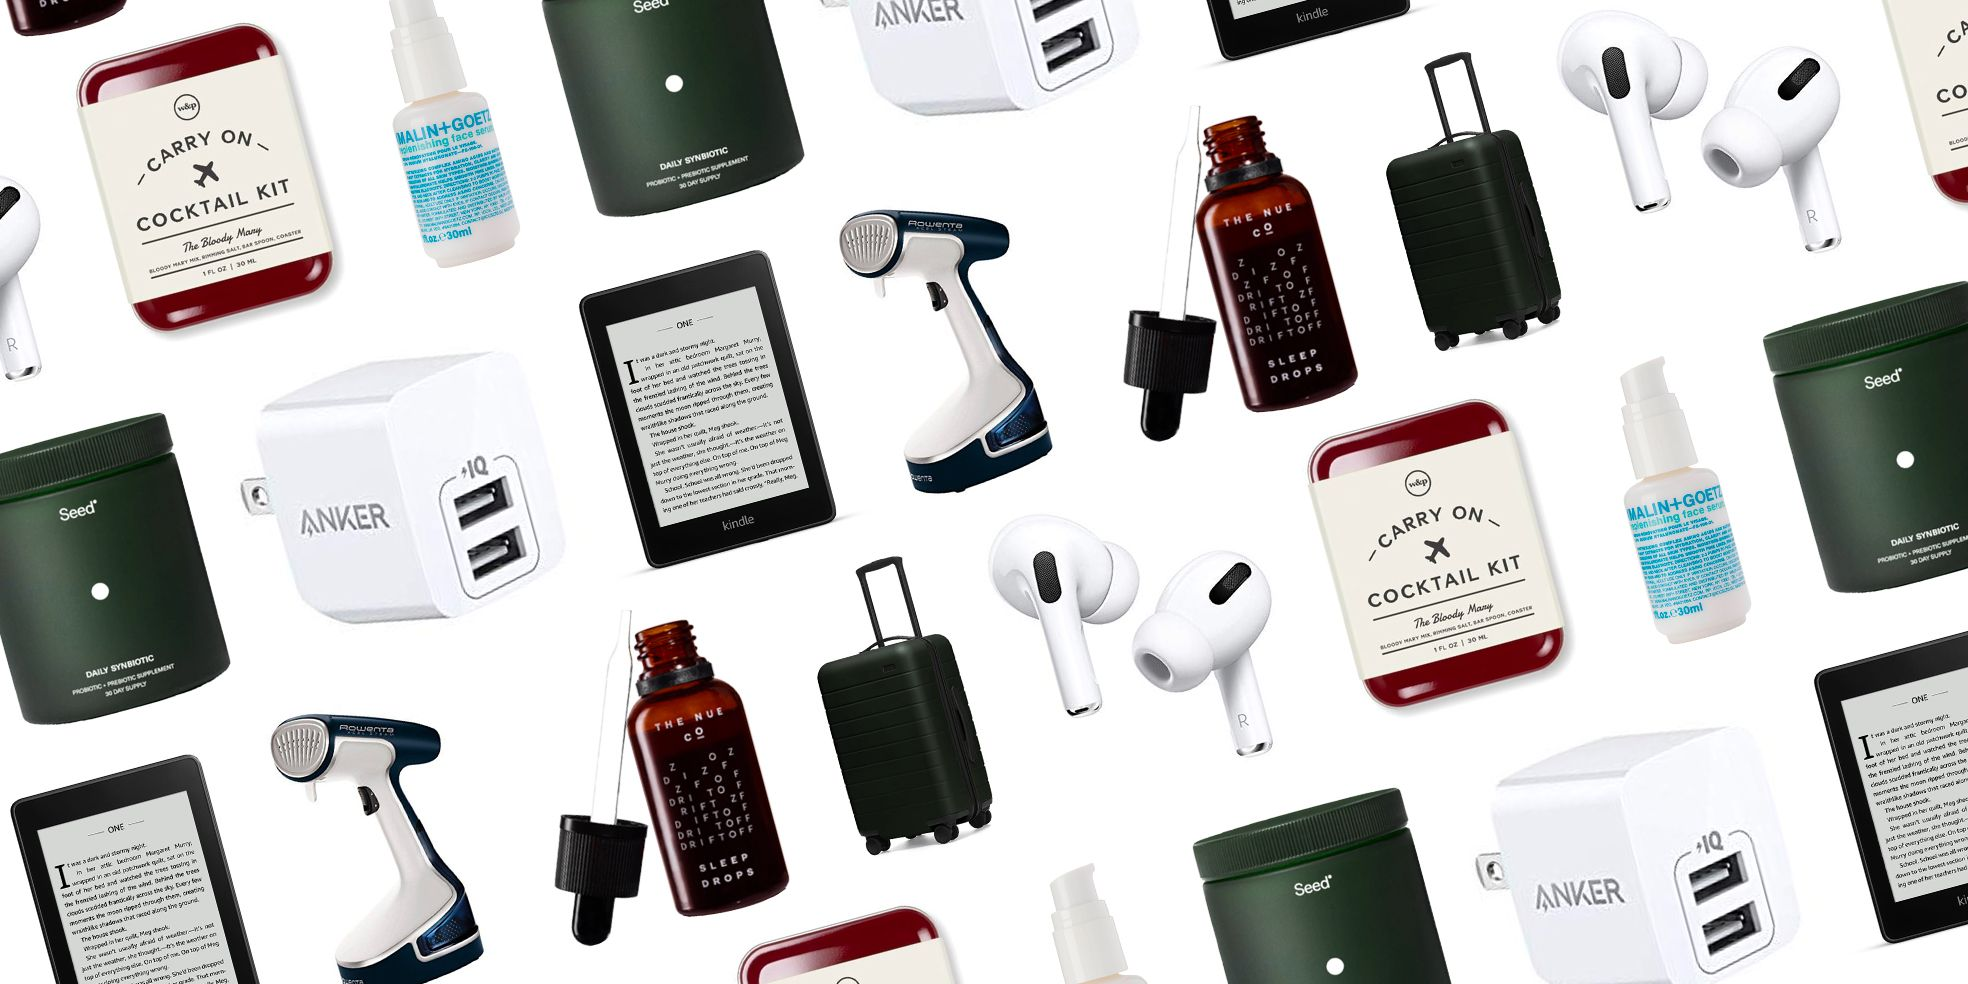 28 Best Travel Accessories For Men Luxury Men S Travel Gear Gadgets 2020